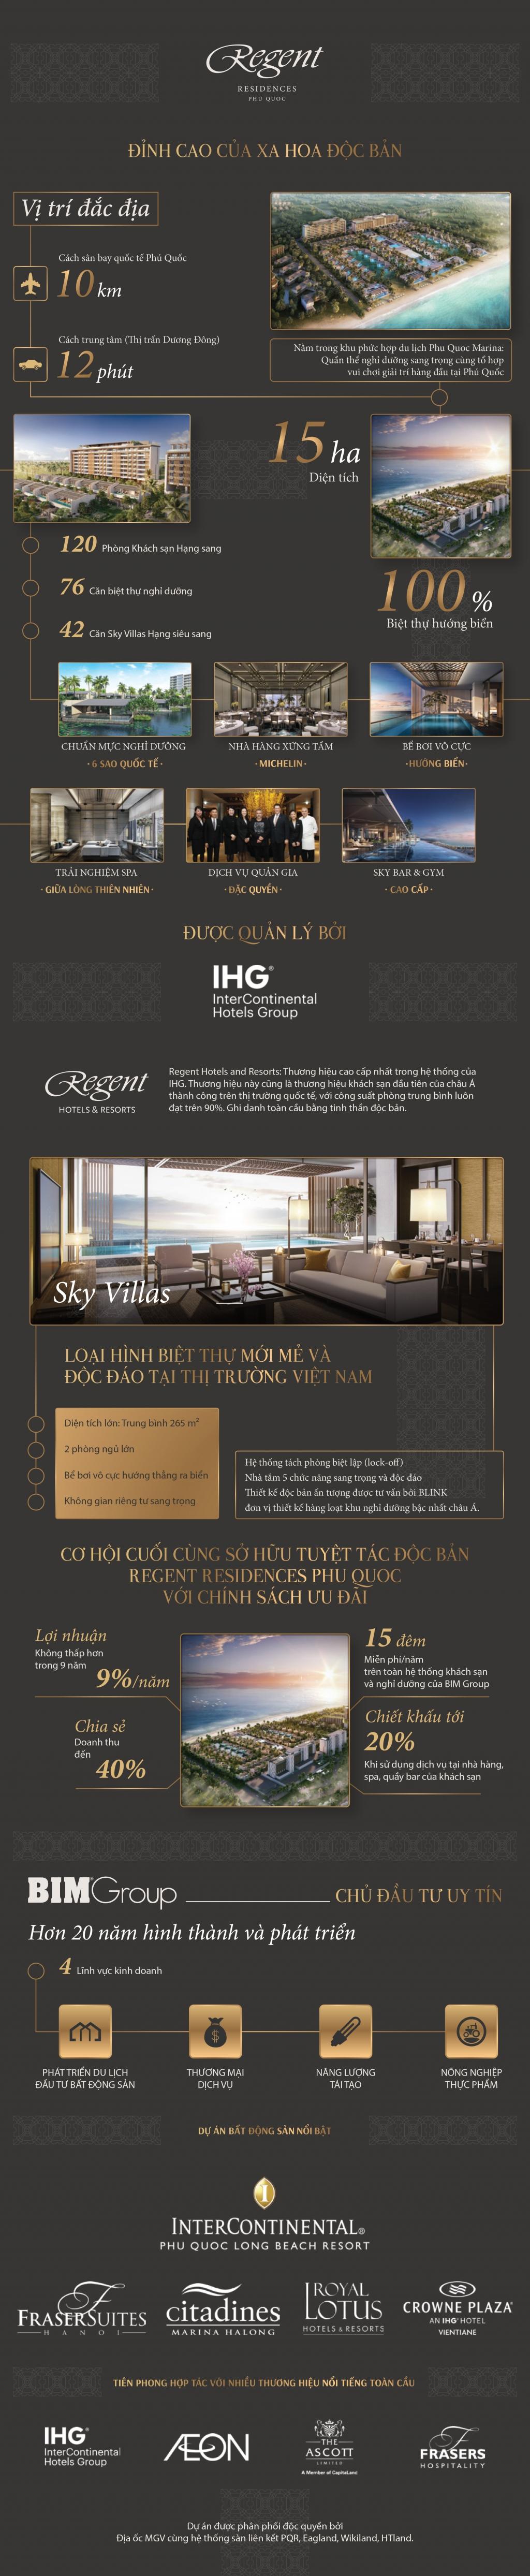 infographics sky villas regent residences quan the nghi duong hang dau tai phu quoc